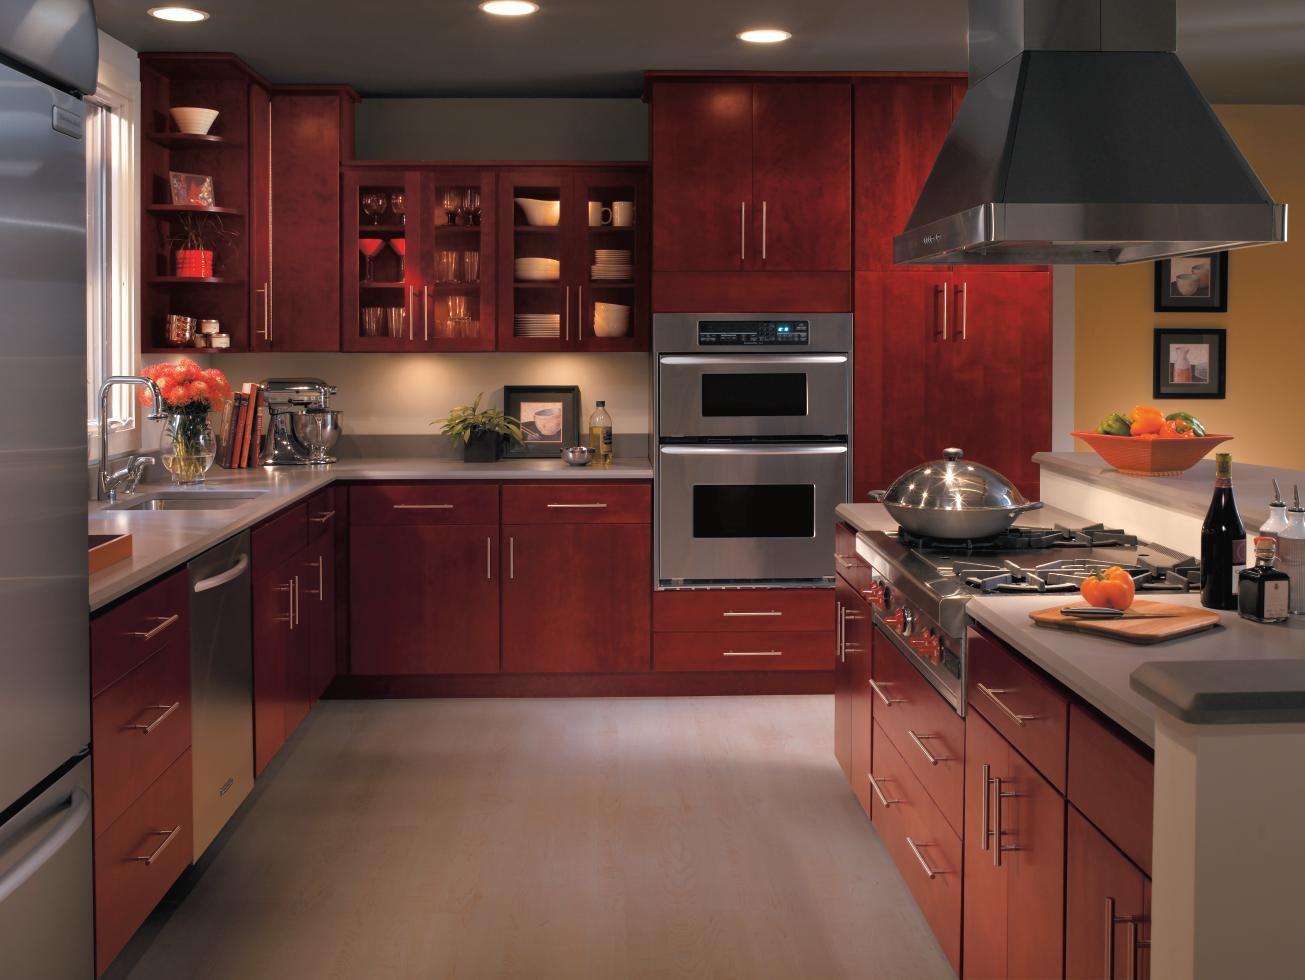 The Beautiful Burgundy Finish On Homecrest S Rainier Cabinets Have Us In A Festive Spirit Enjoy The Ho Cherry Cabinets Kitchen Kitchen Design Kitchen Cabinets